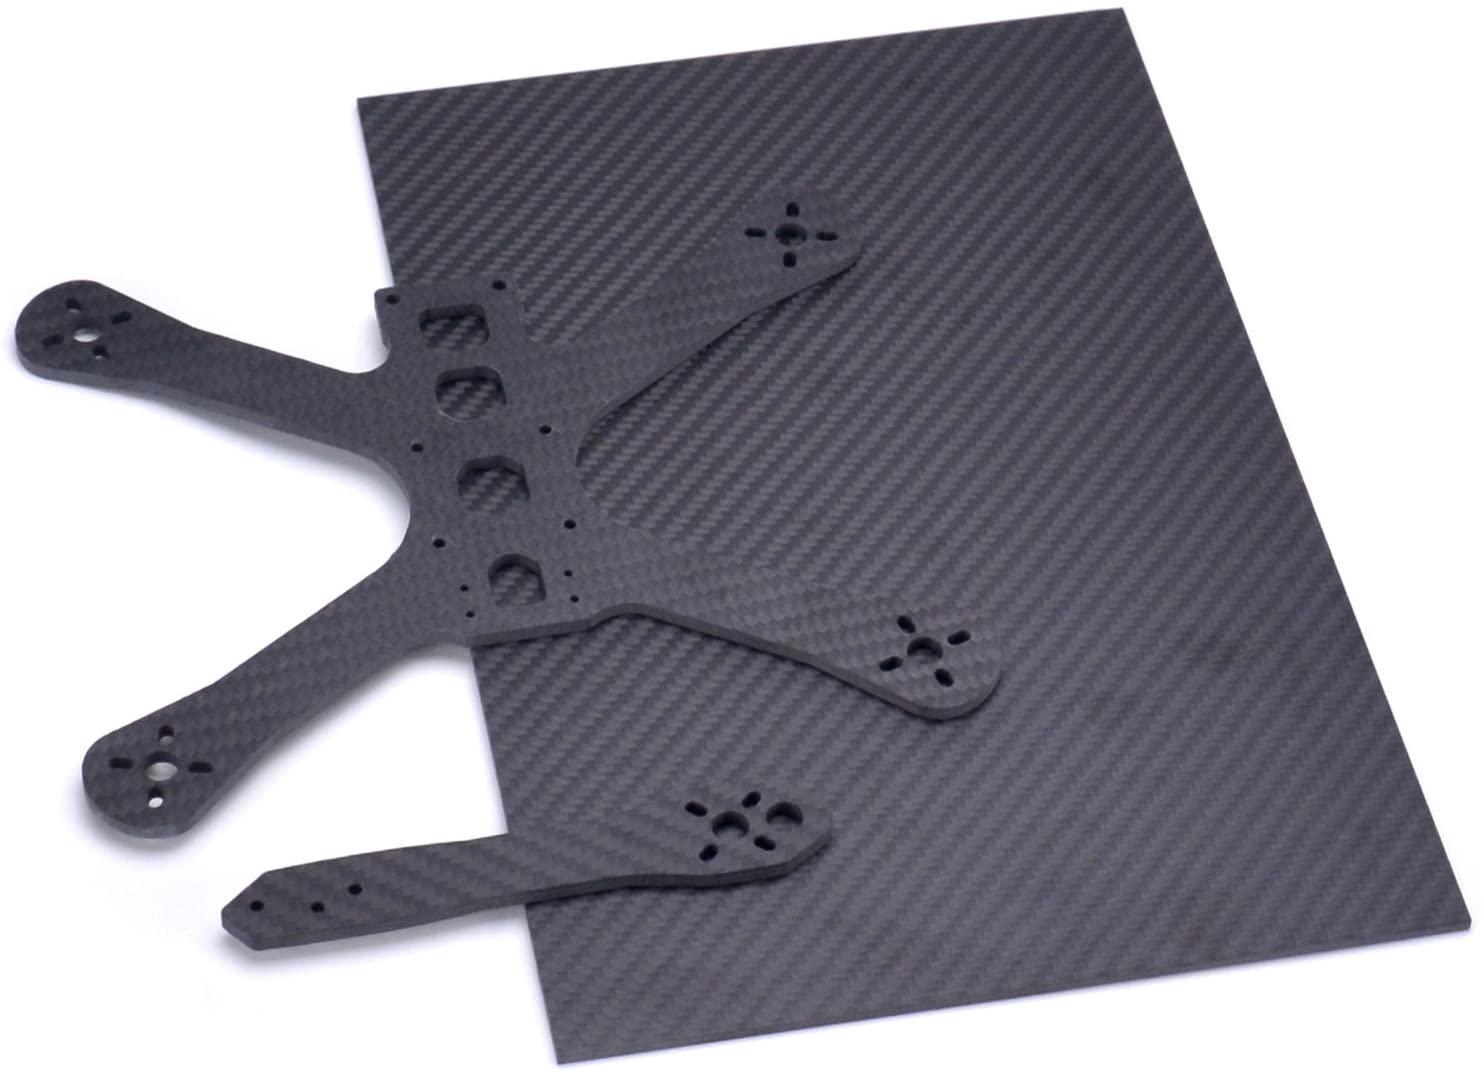 Readytosky 3K Carbon Fiber Plate Sheet 200mm X 300mm X 3MM Thickness Pure Carbon Fiber Board for DIY Drone Frame Etc.